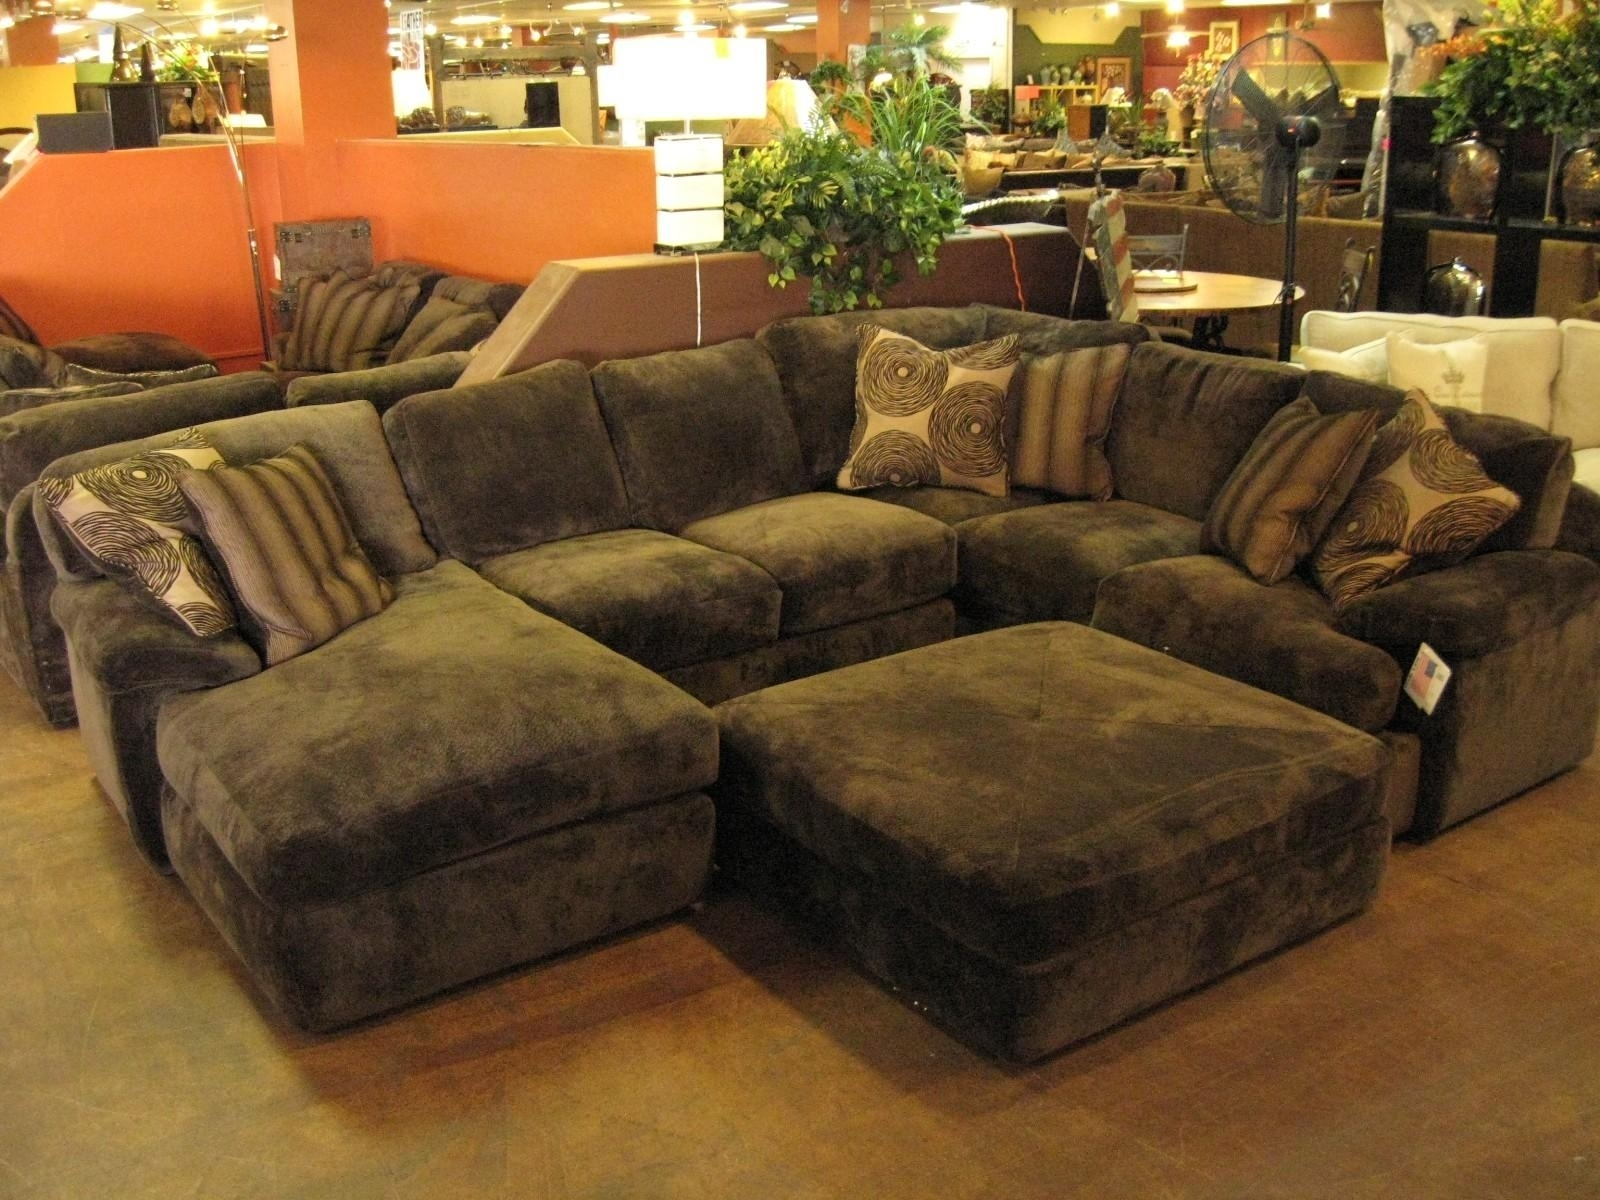 20 Top Sectional Sofa With Large Ottoman | Sofa Ideas Intended For Sofas With Large Ottoman (Gallery 2 of 10)